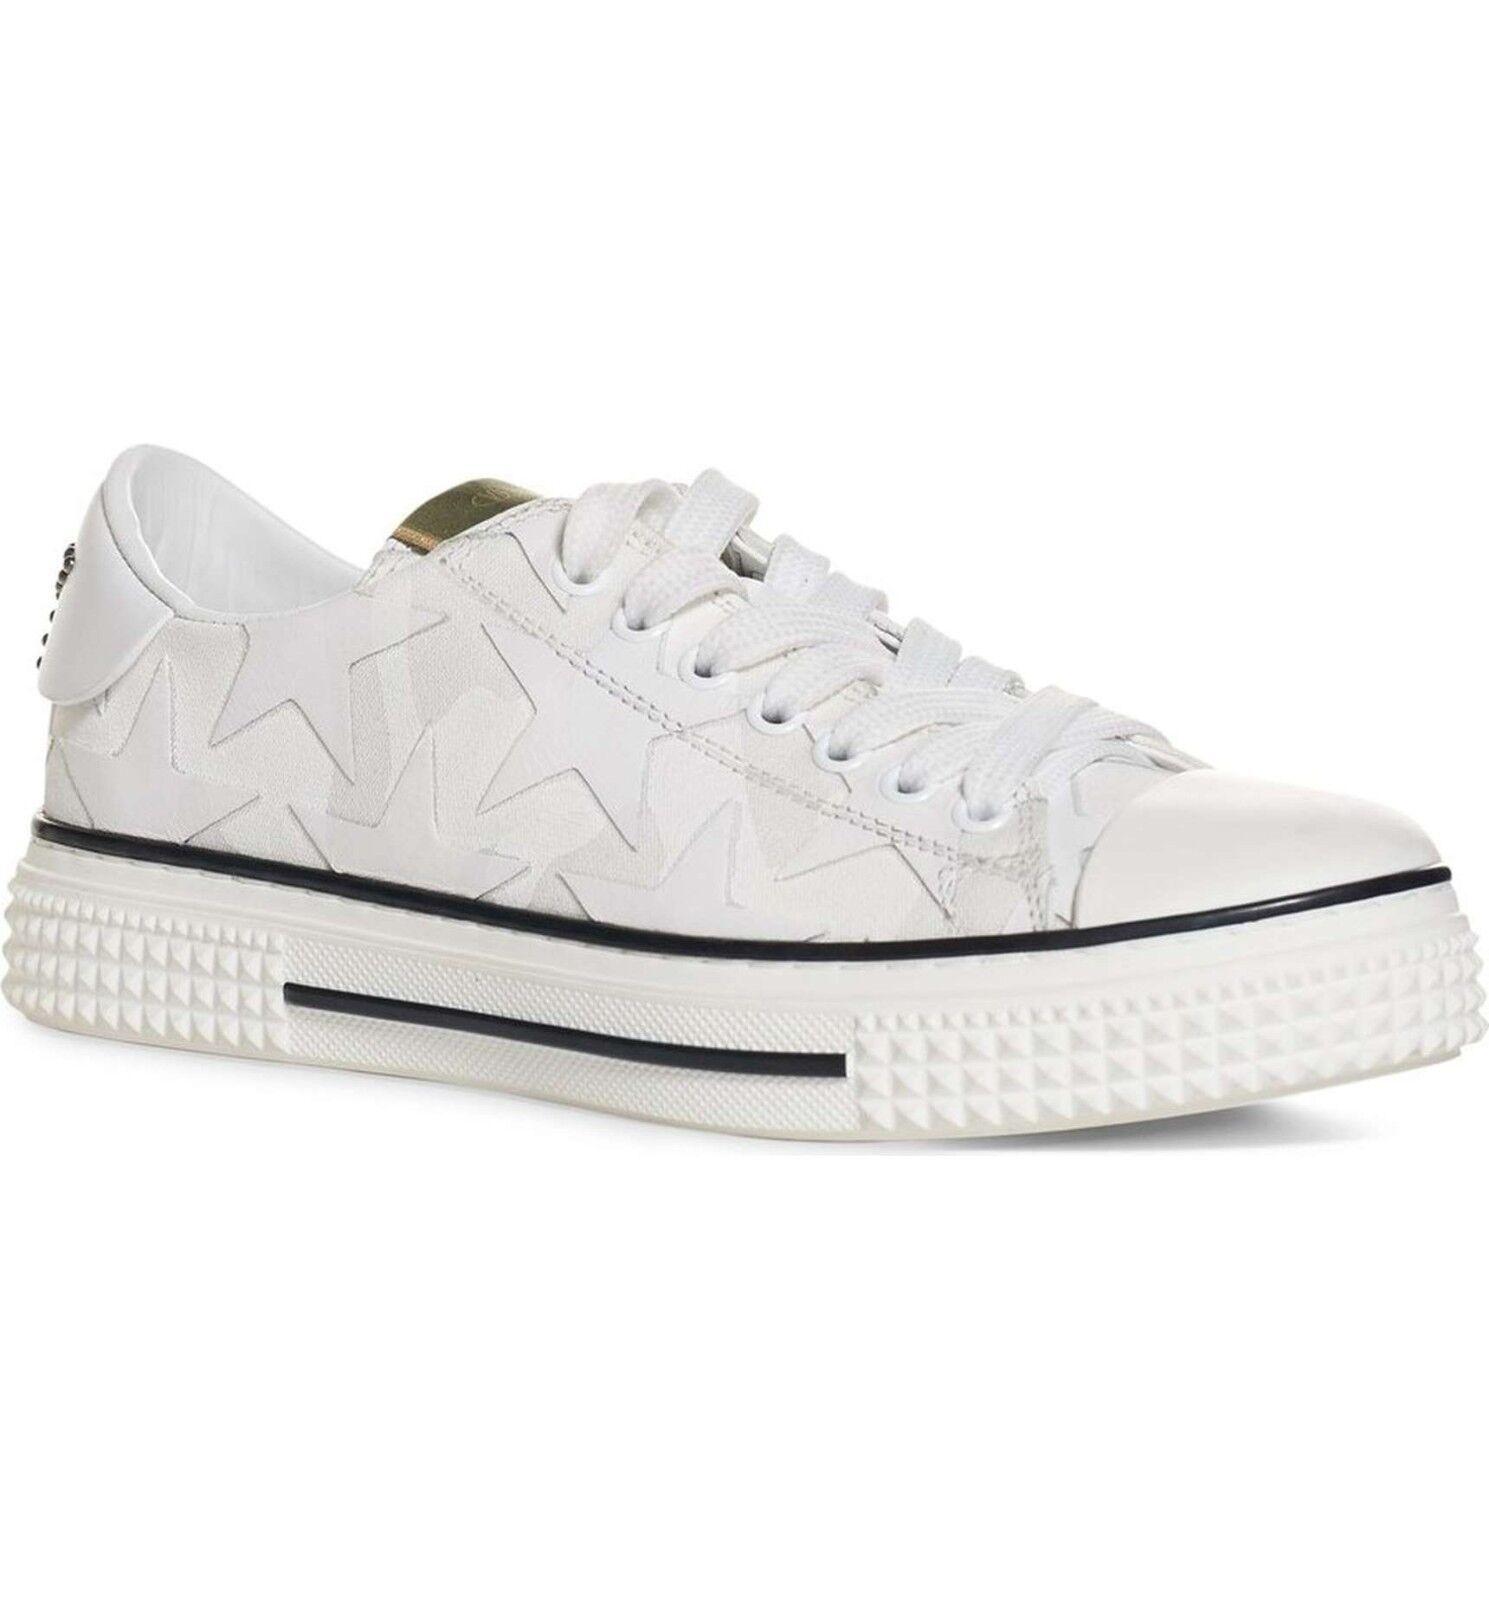 945.00 Valentino Garavani 'Star' Low Top Sneakers  sz US 10   EU 40 white